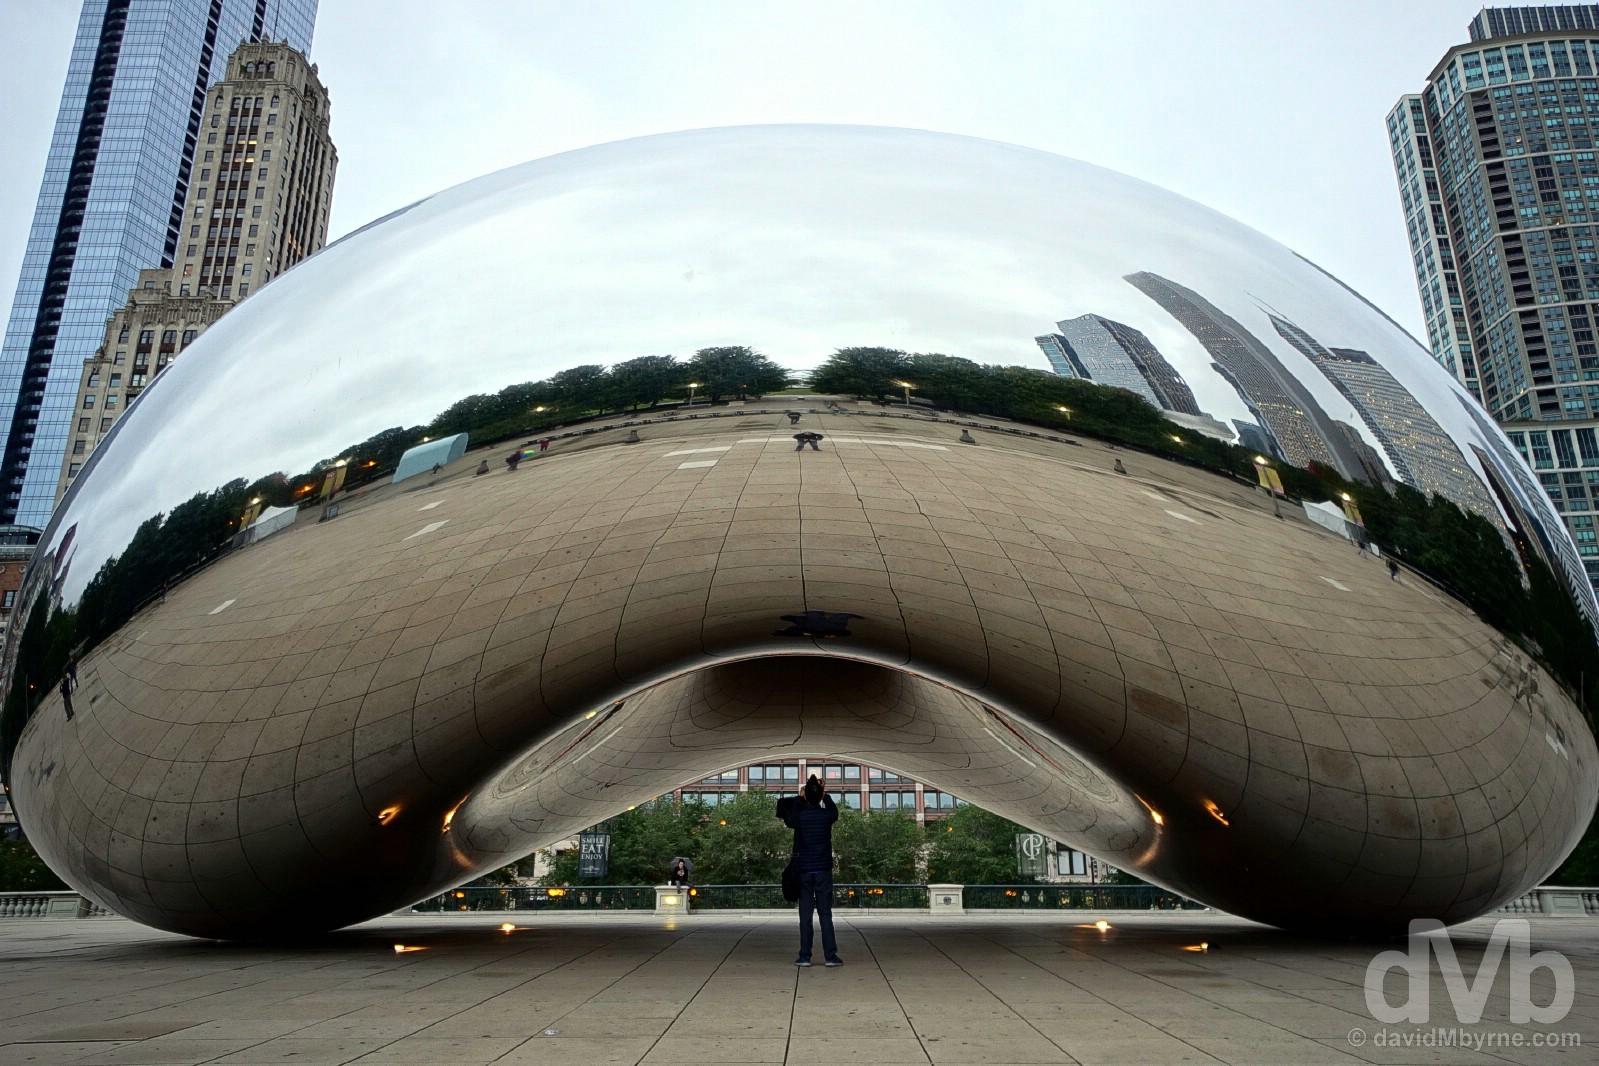 The Cloud Gate, a.k.a. The Bean, Millennium Park, Chicago, Illinois, USA. September 30, 2016.